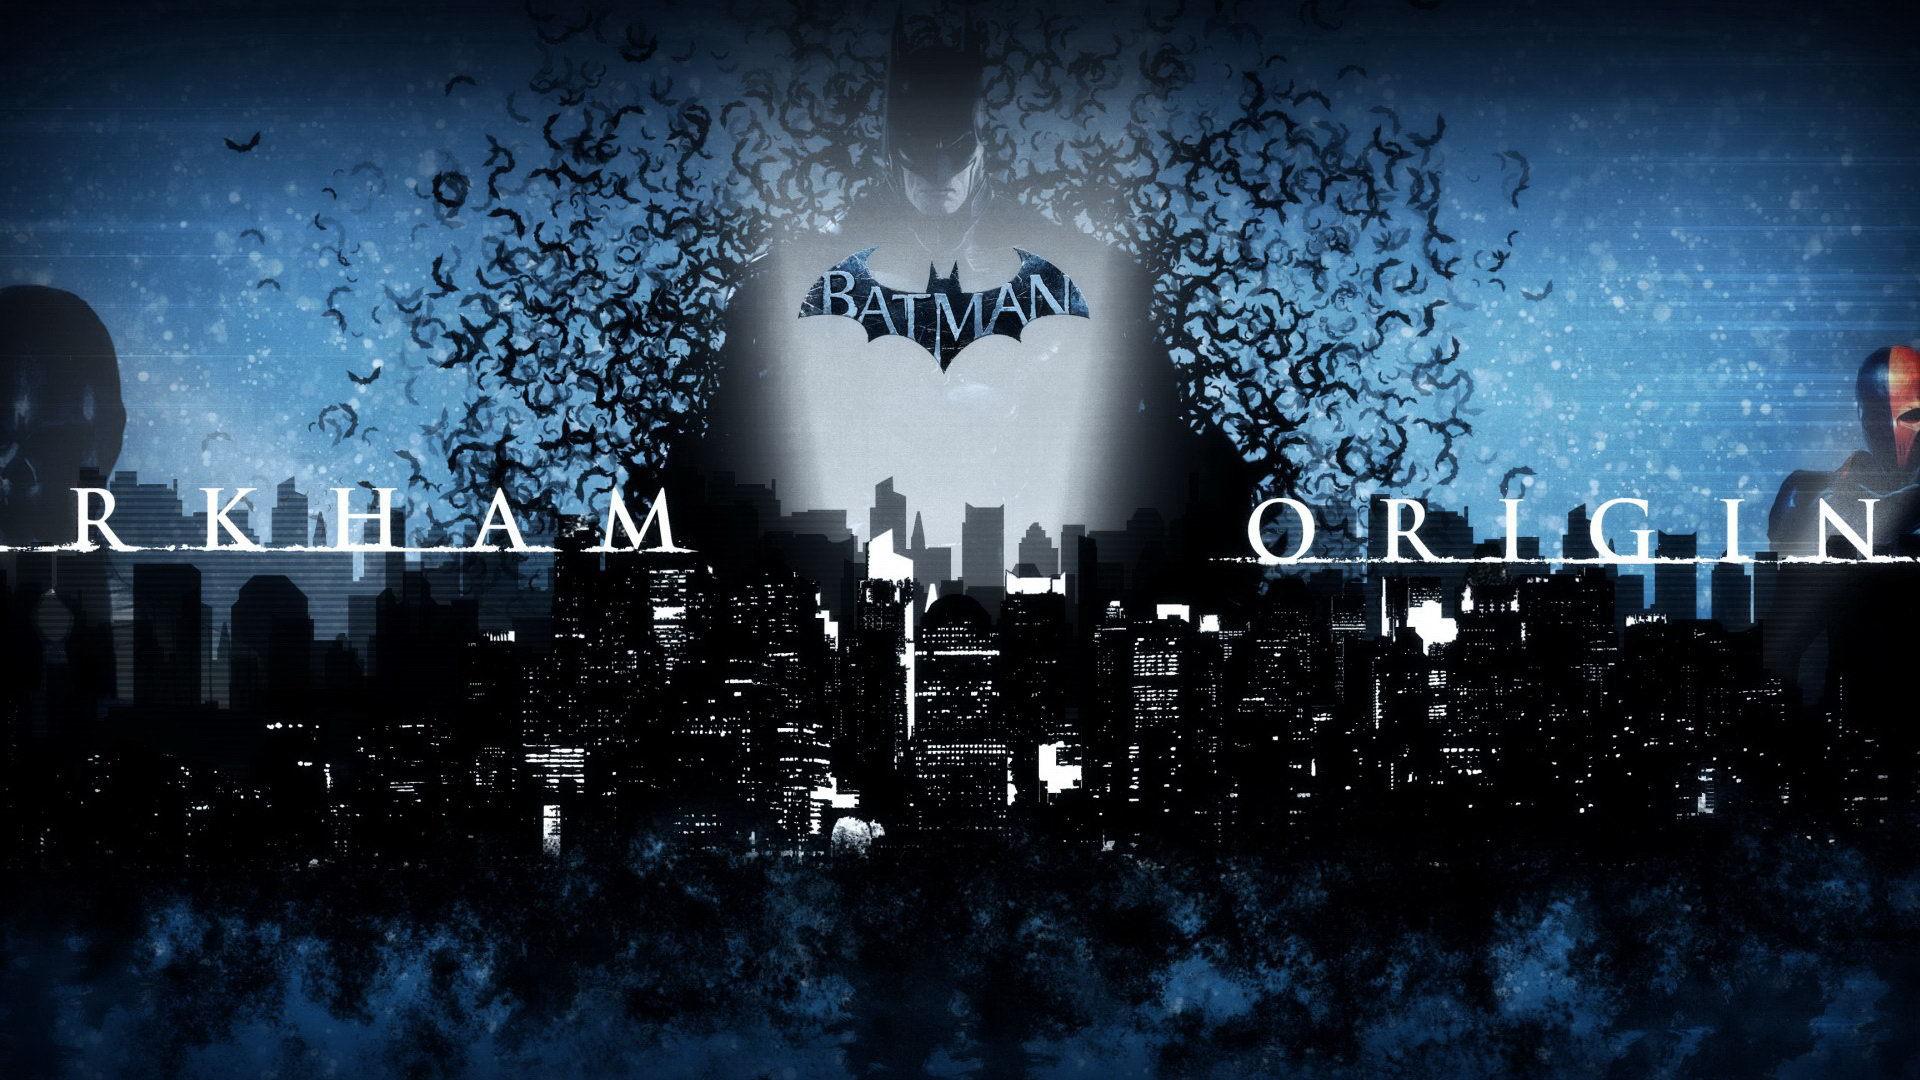 Batman Arkham Origins Screensaver Hd Wallpapers And Images 1920x1080